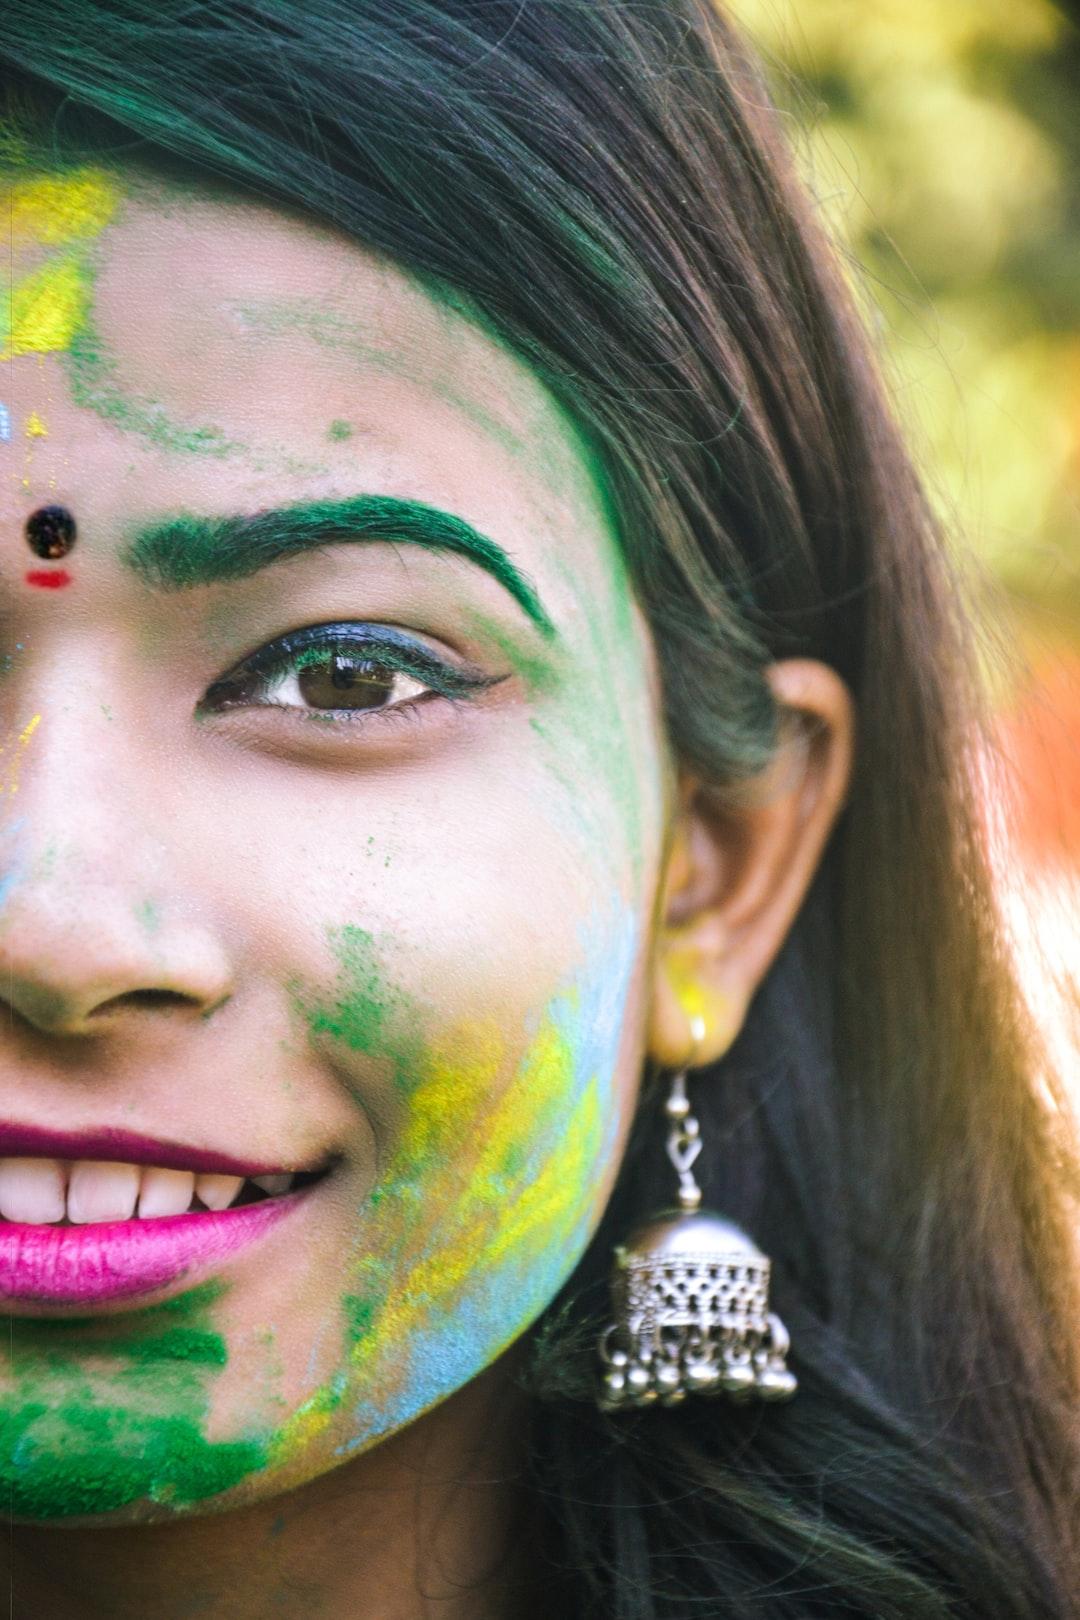 For more Portraits do follow me on Instagram @Purtika_Dutt